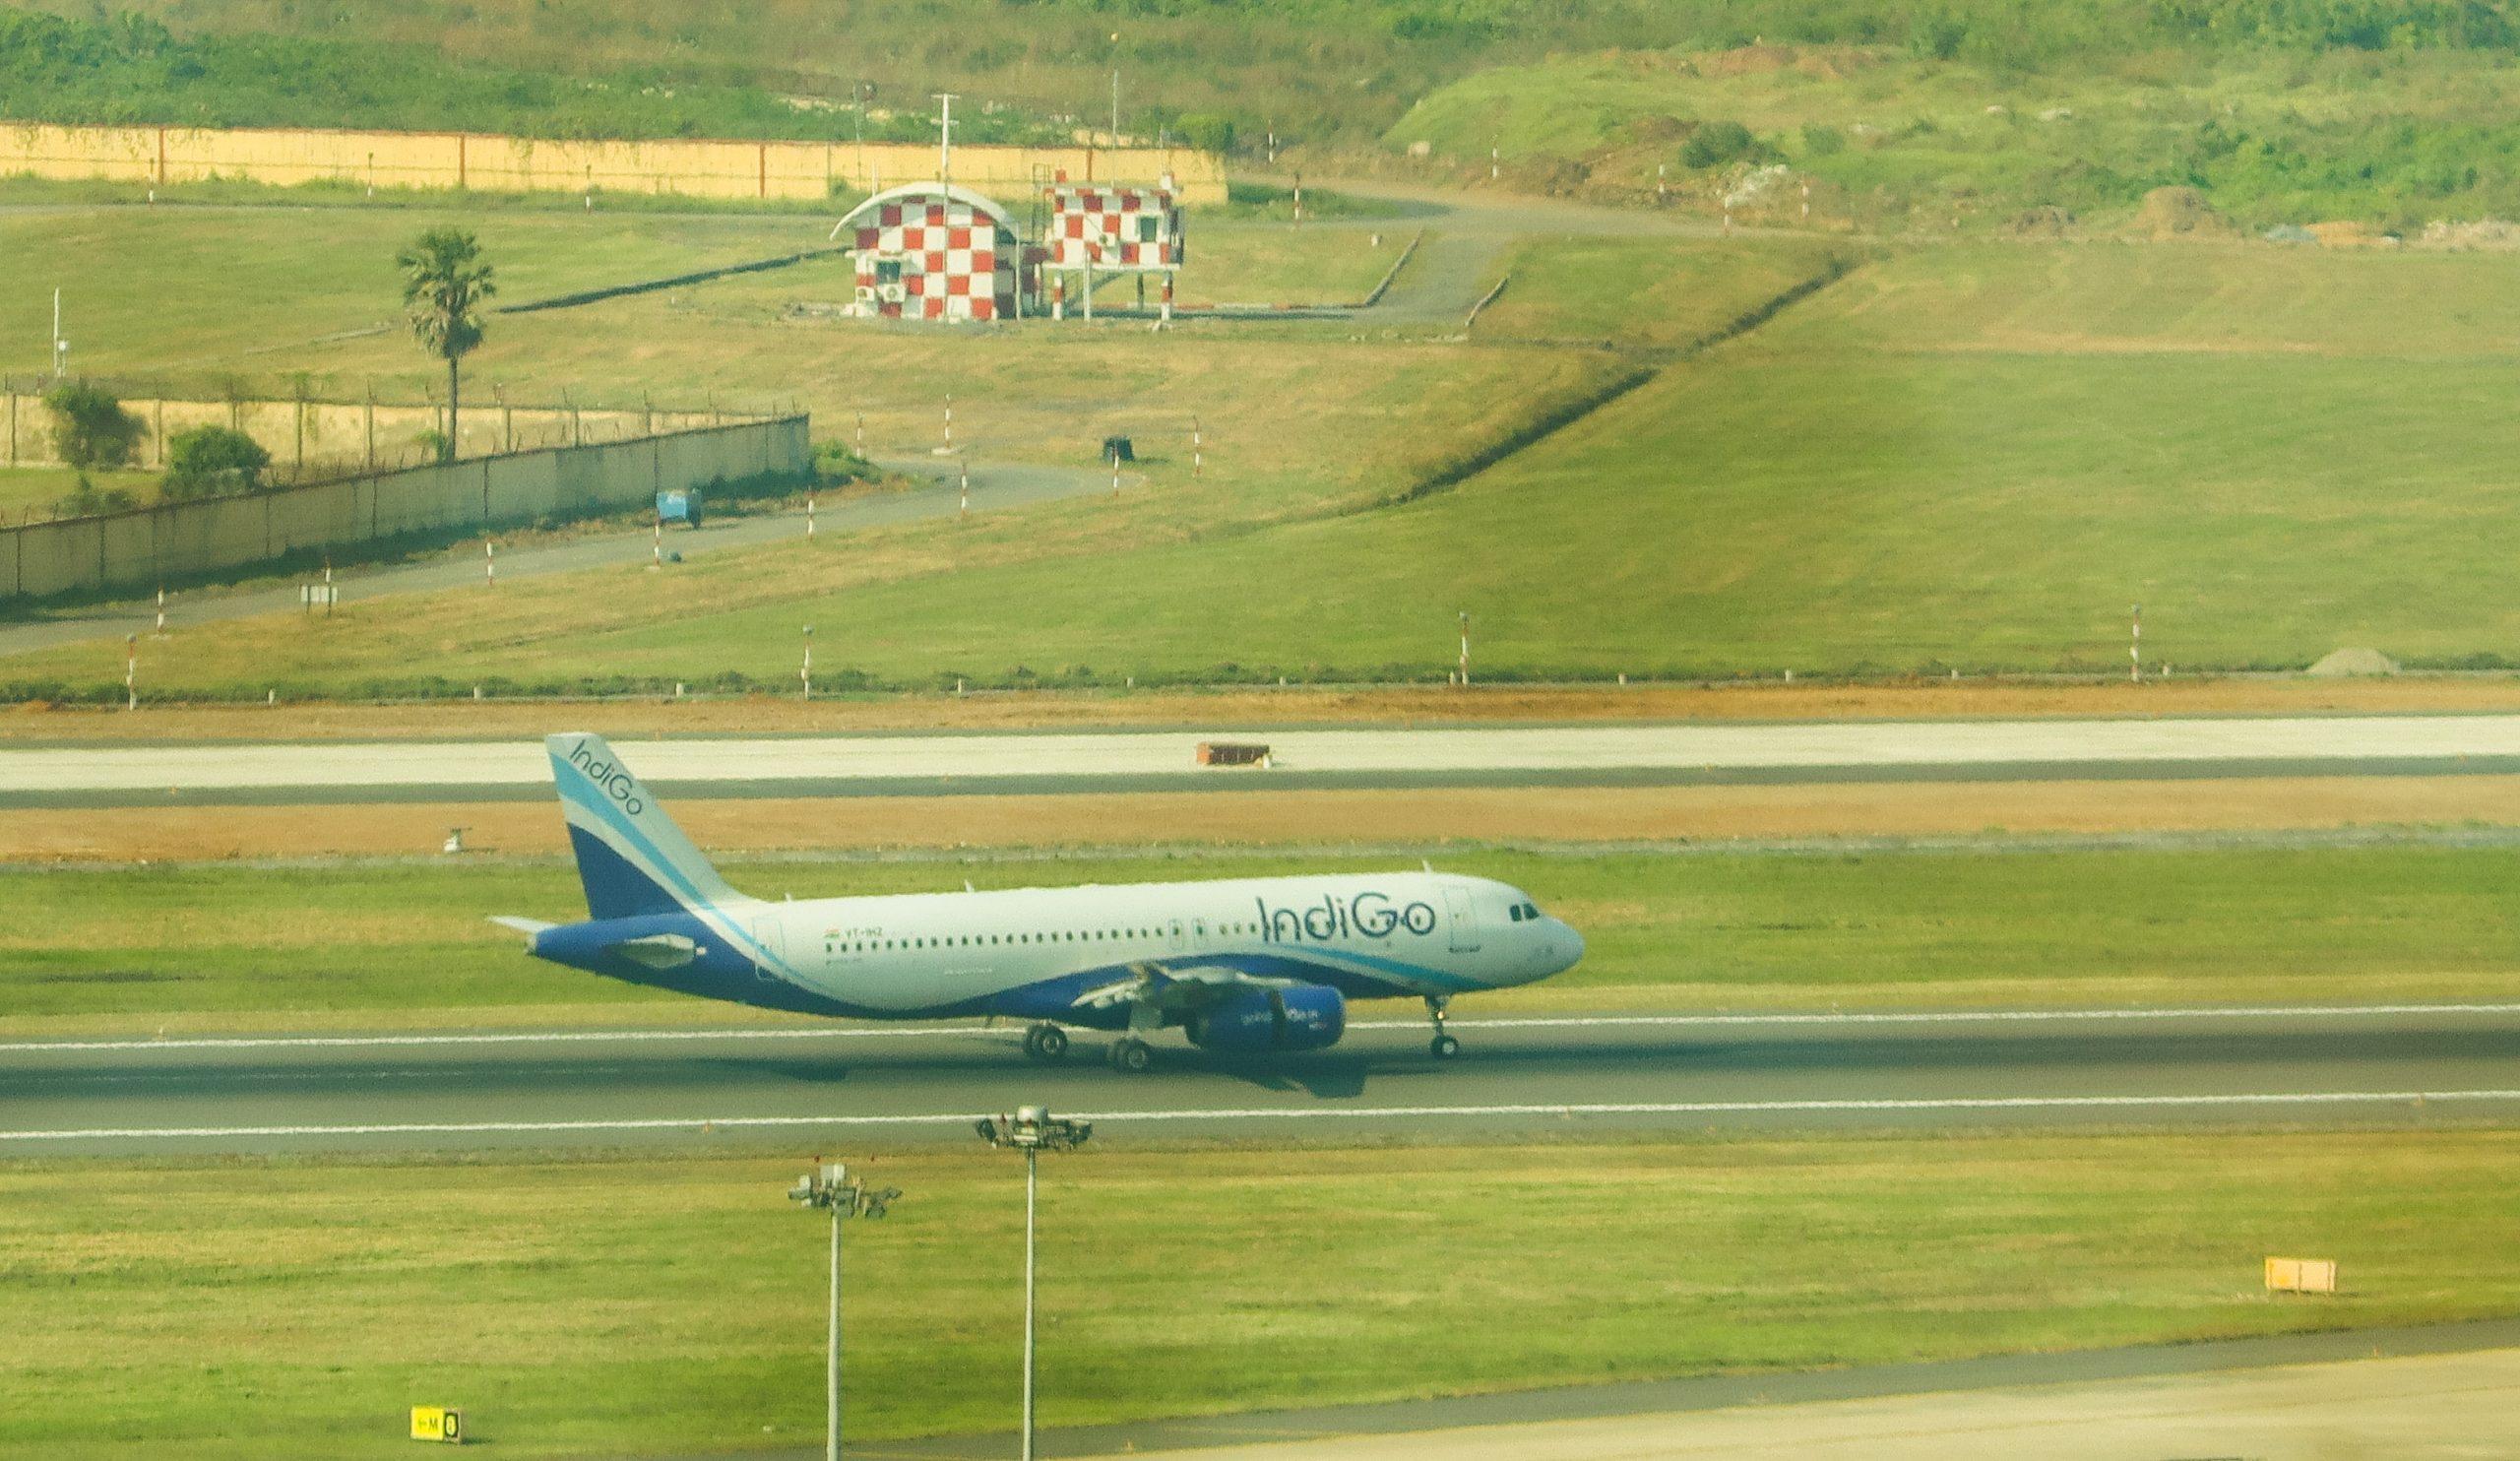 Aero plane on runway